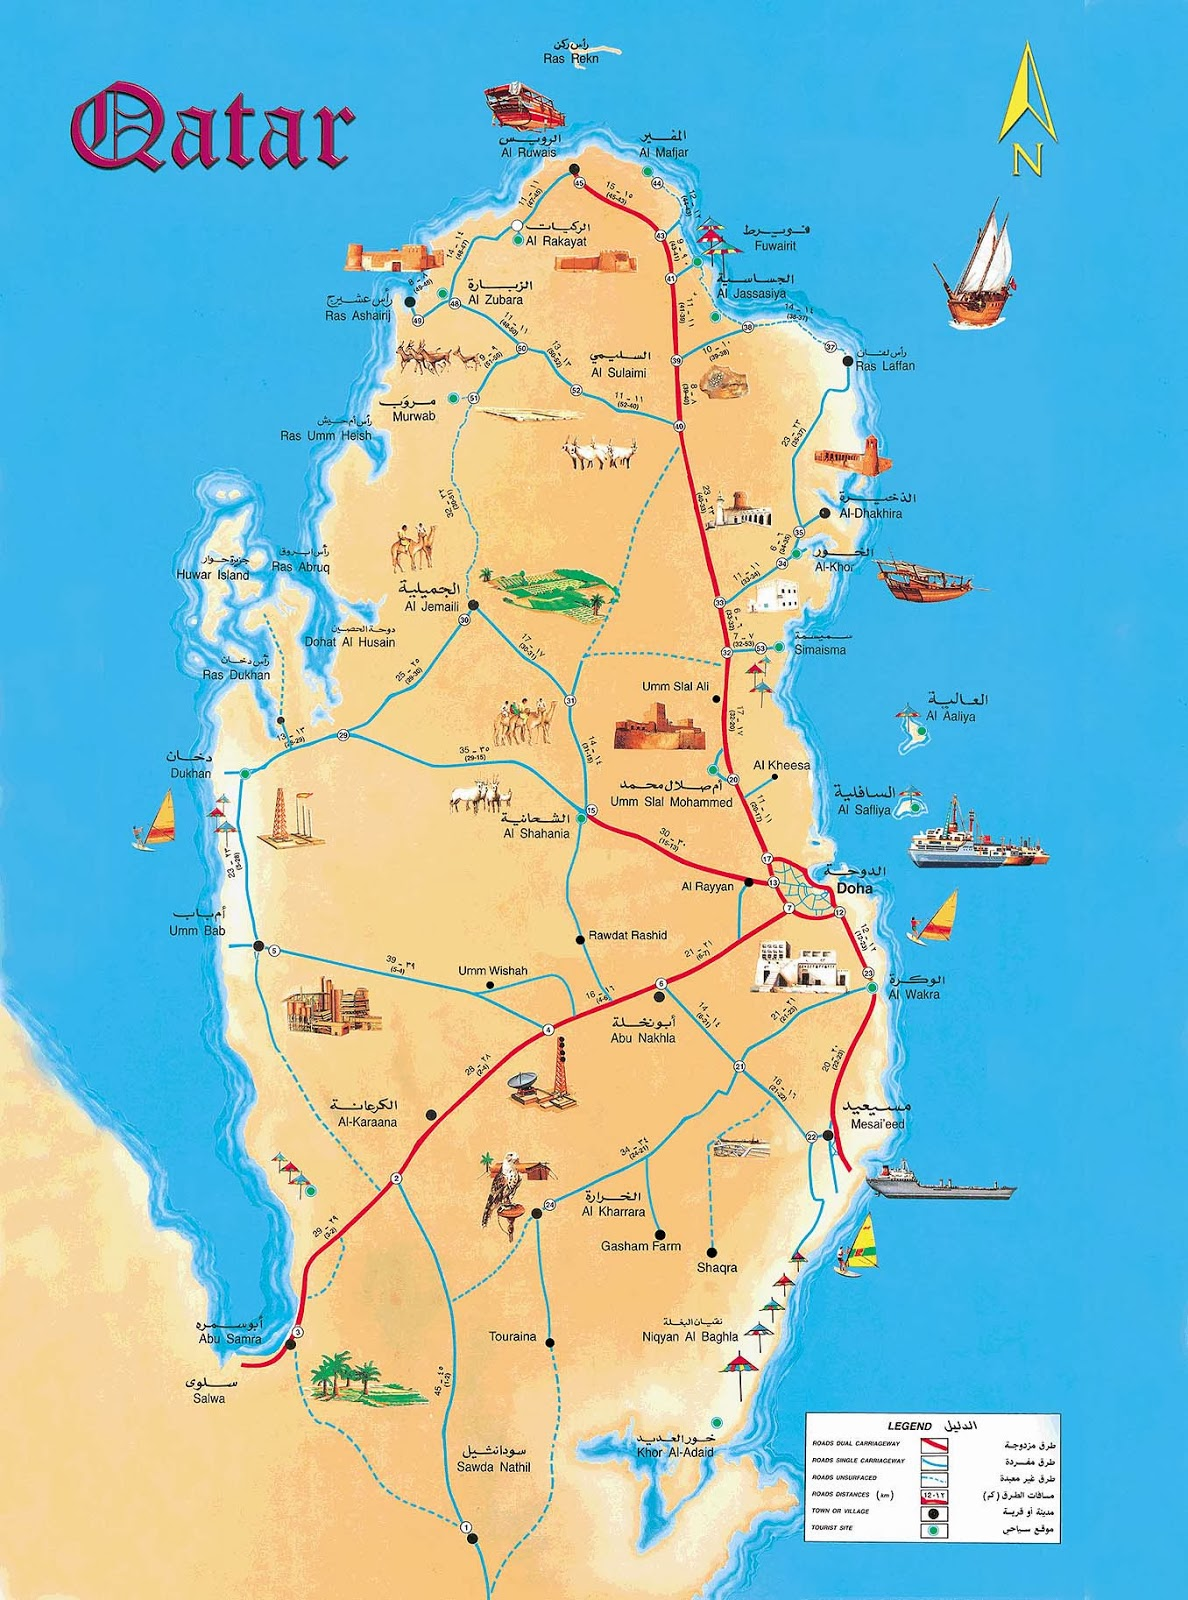 Mapas De Doha Catar Mapasblog